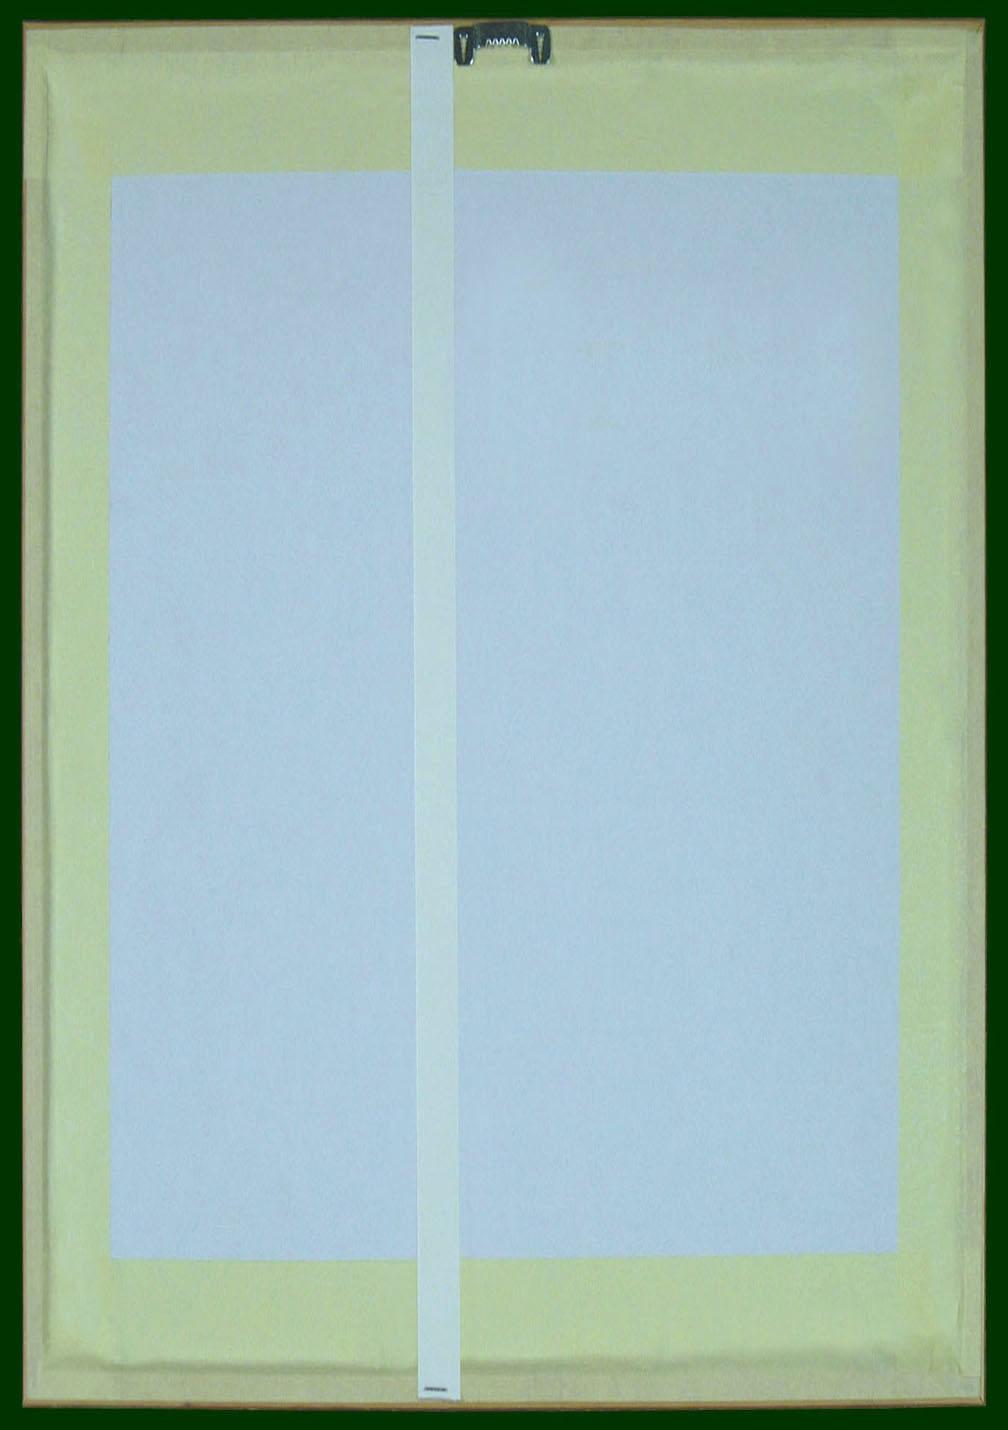 93-24hat buher.jpg (1008×1430)